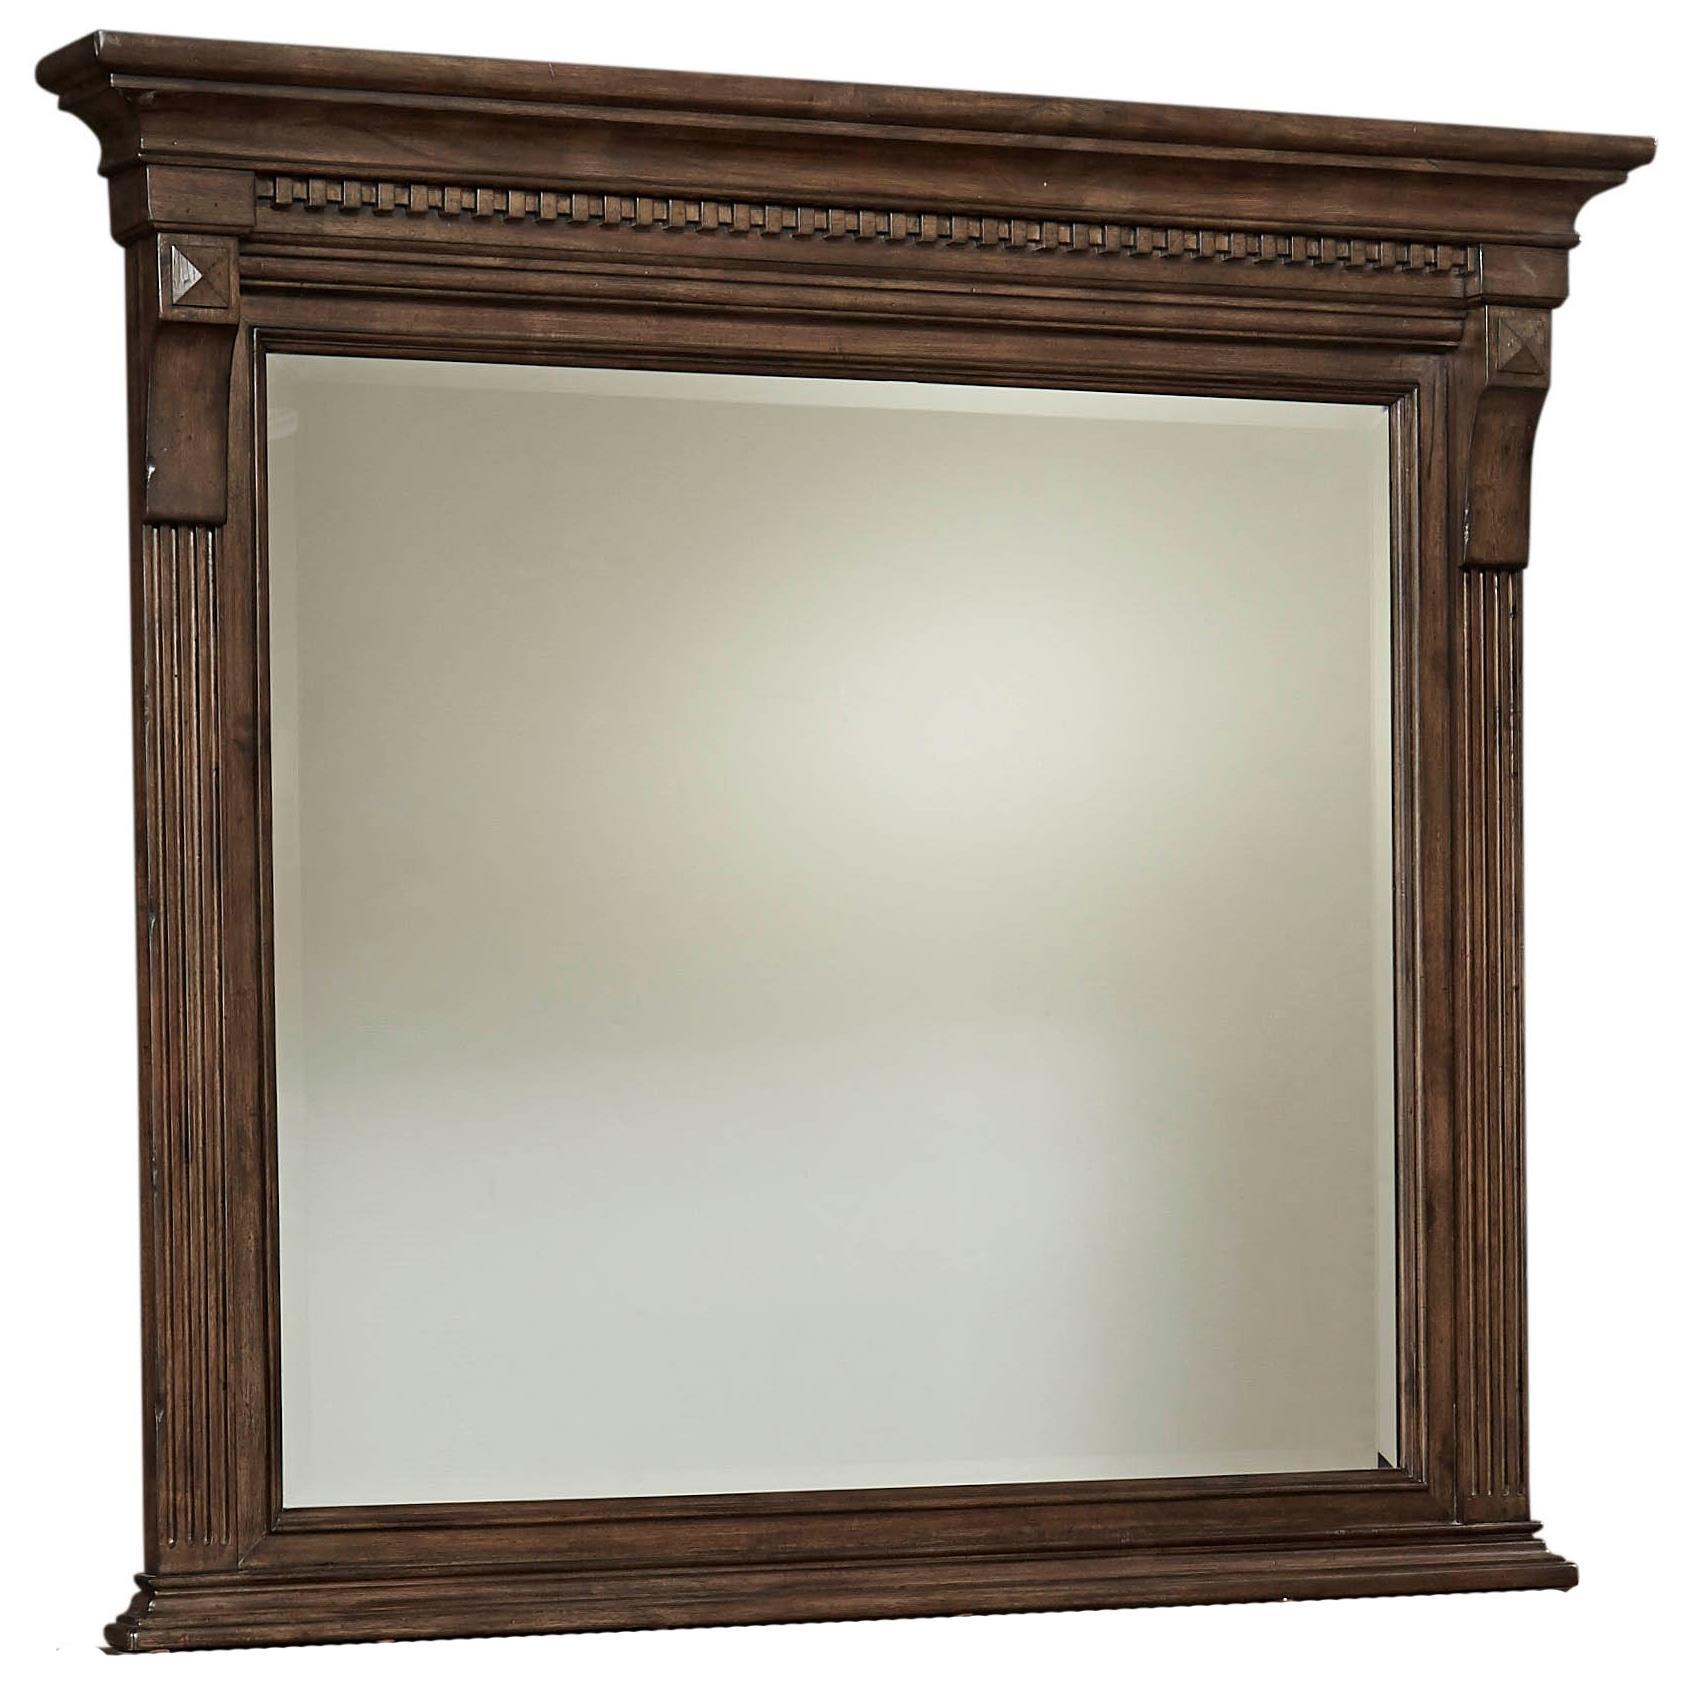 Broyhill Furniture Lyla Landscape Dresser Mirror - Item Number: 4912-236